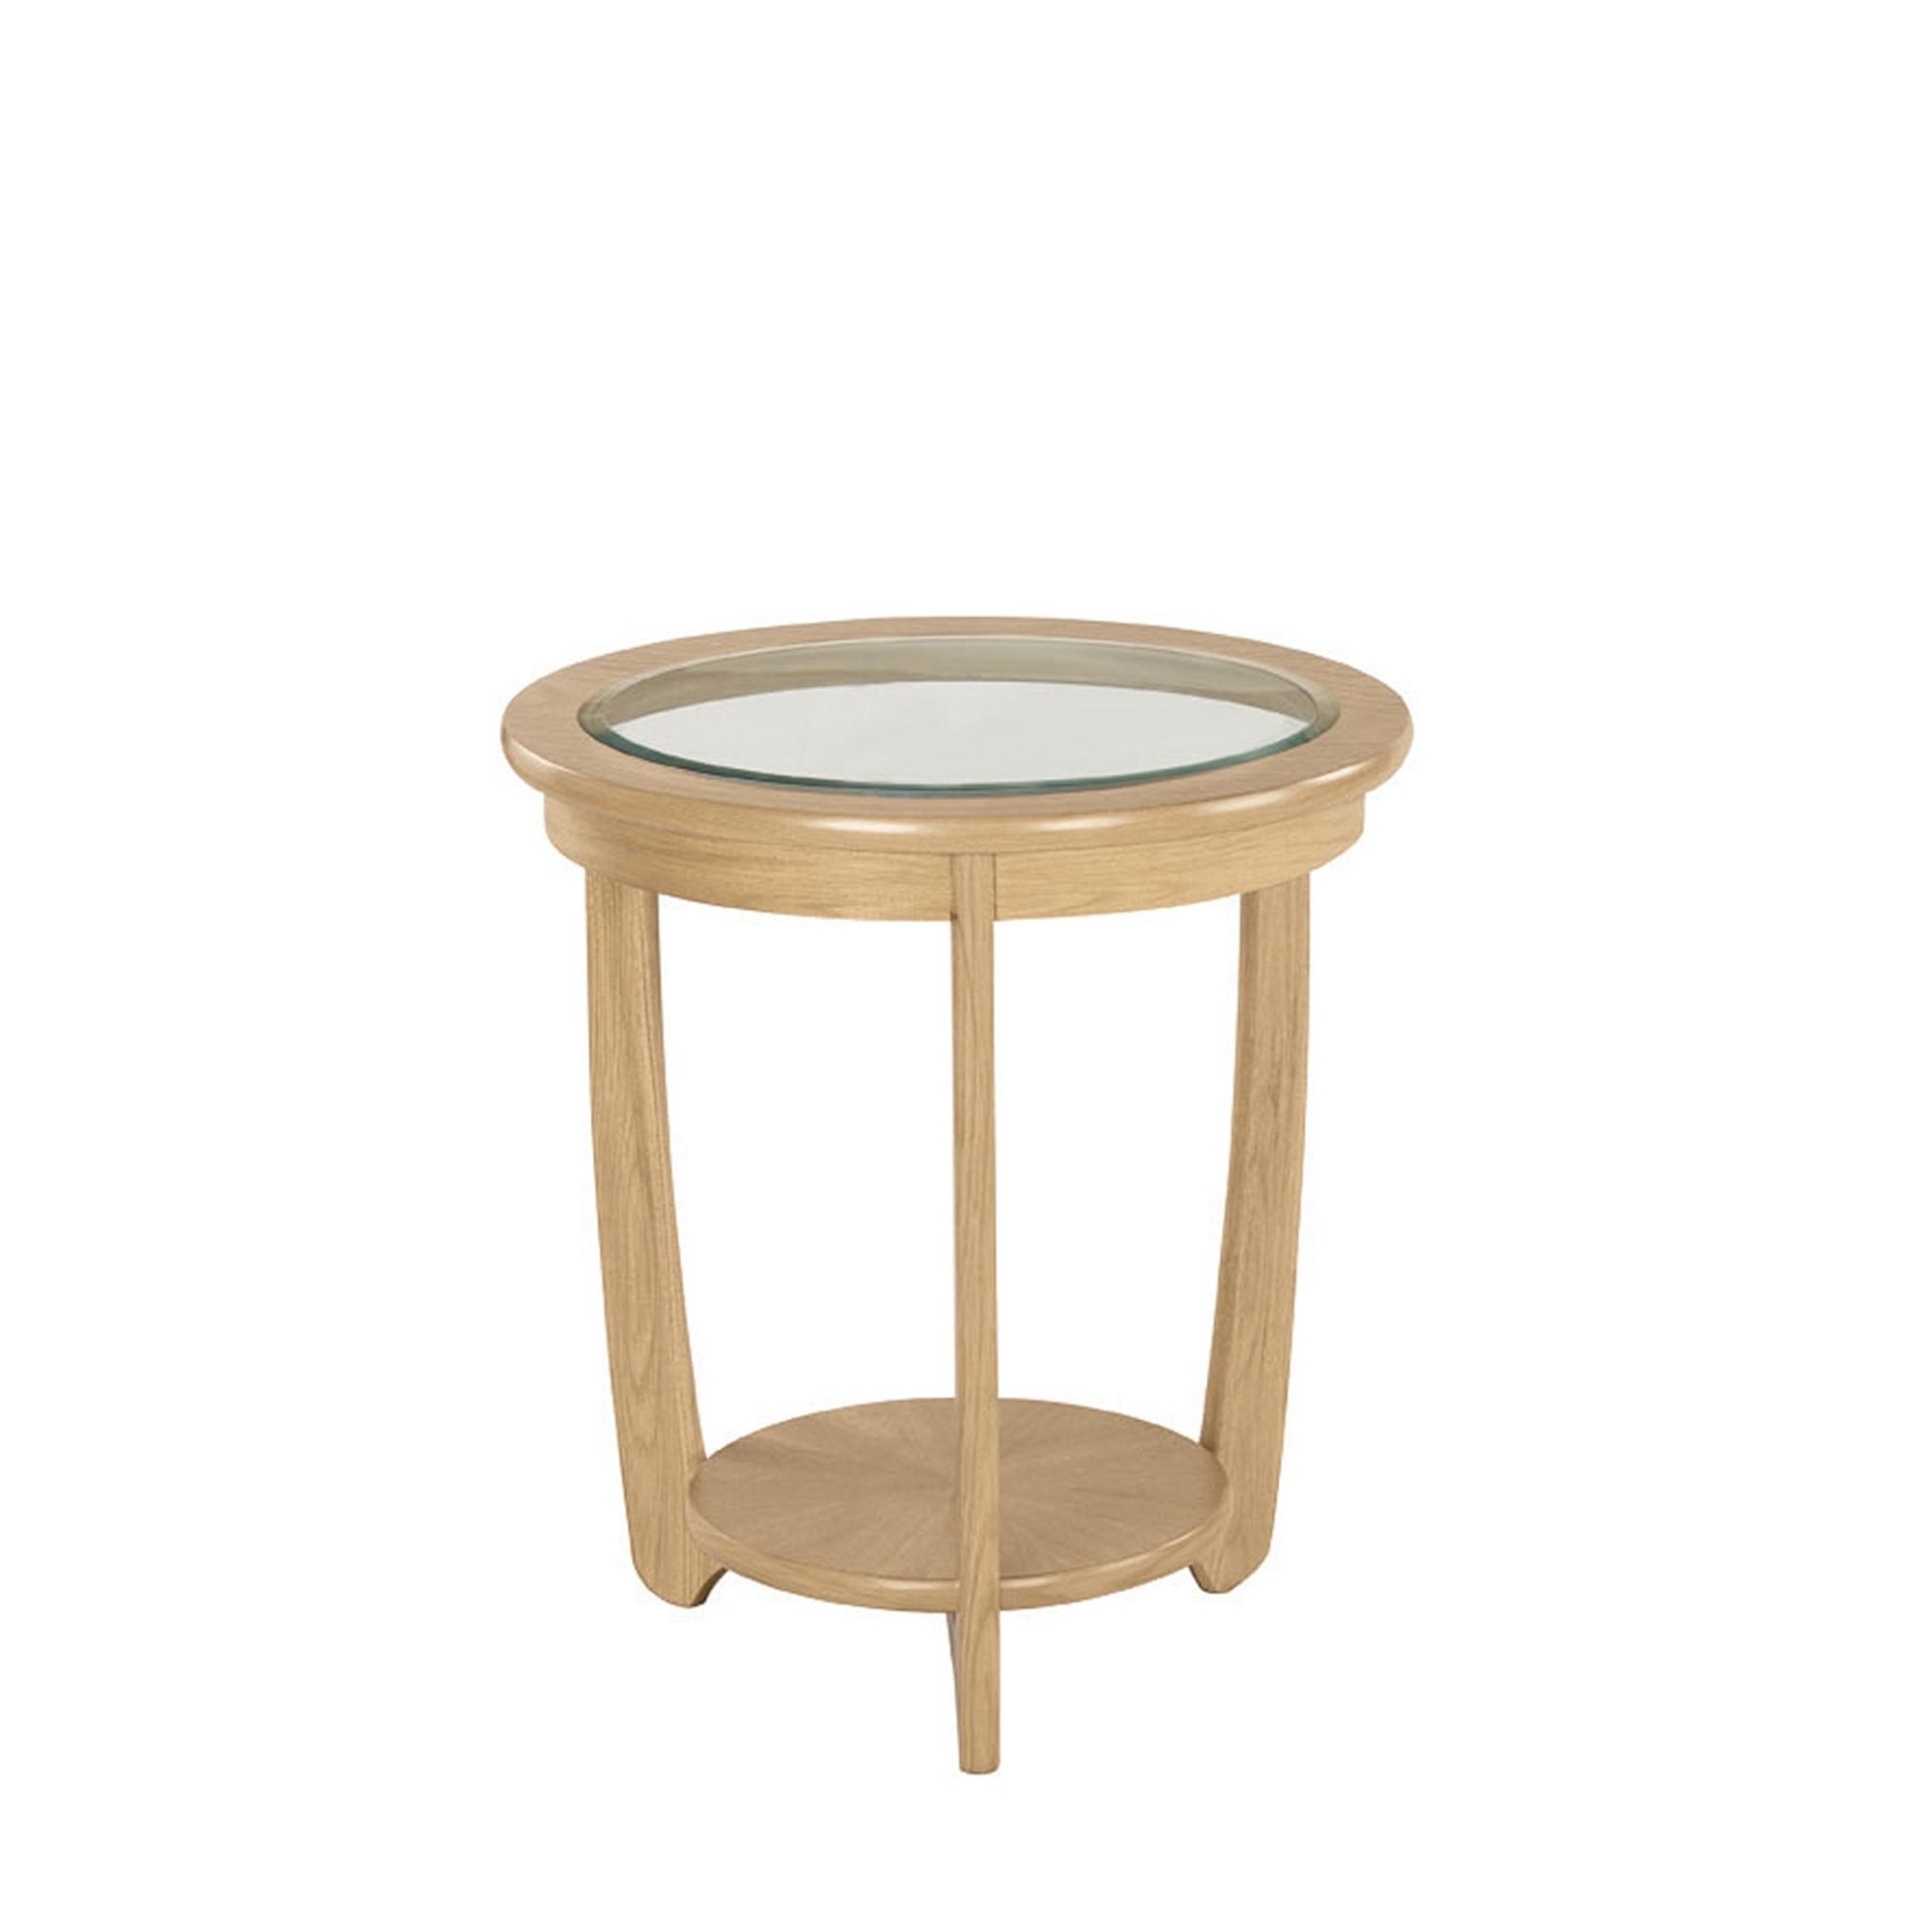 Shades Oak Nathan Shades Oak Glass Top Round Lamp Table